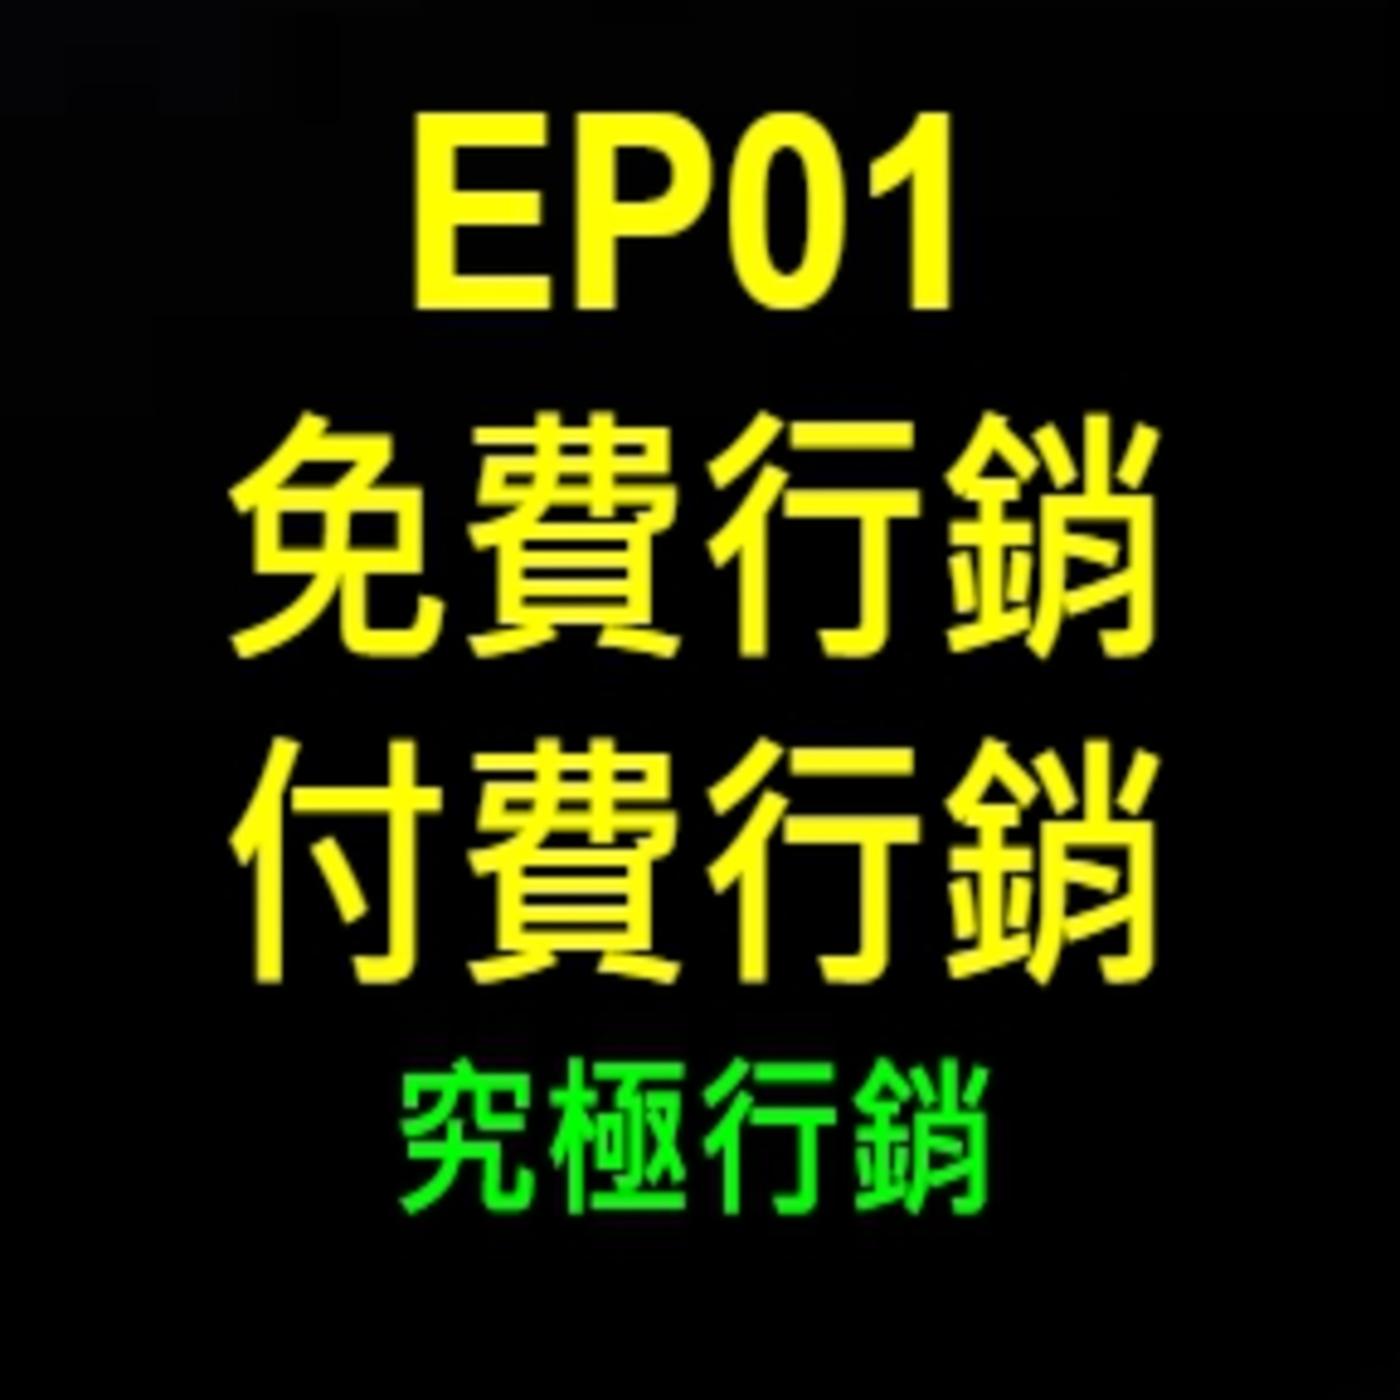 EP01 免費行銷 V.S 付費行銷